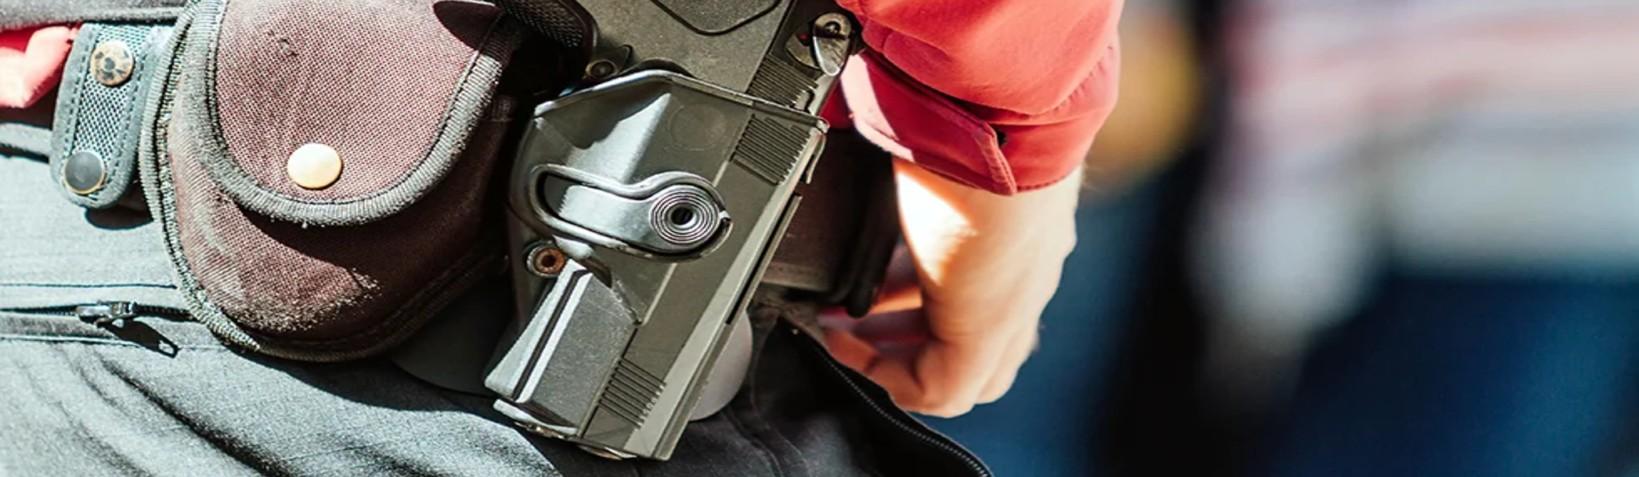 <b>California Penal Code 26350 PC: </b><br>Open Carry Gun Laws